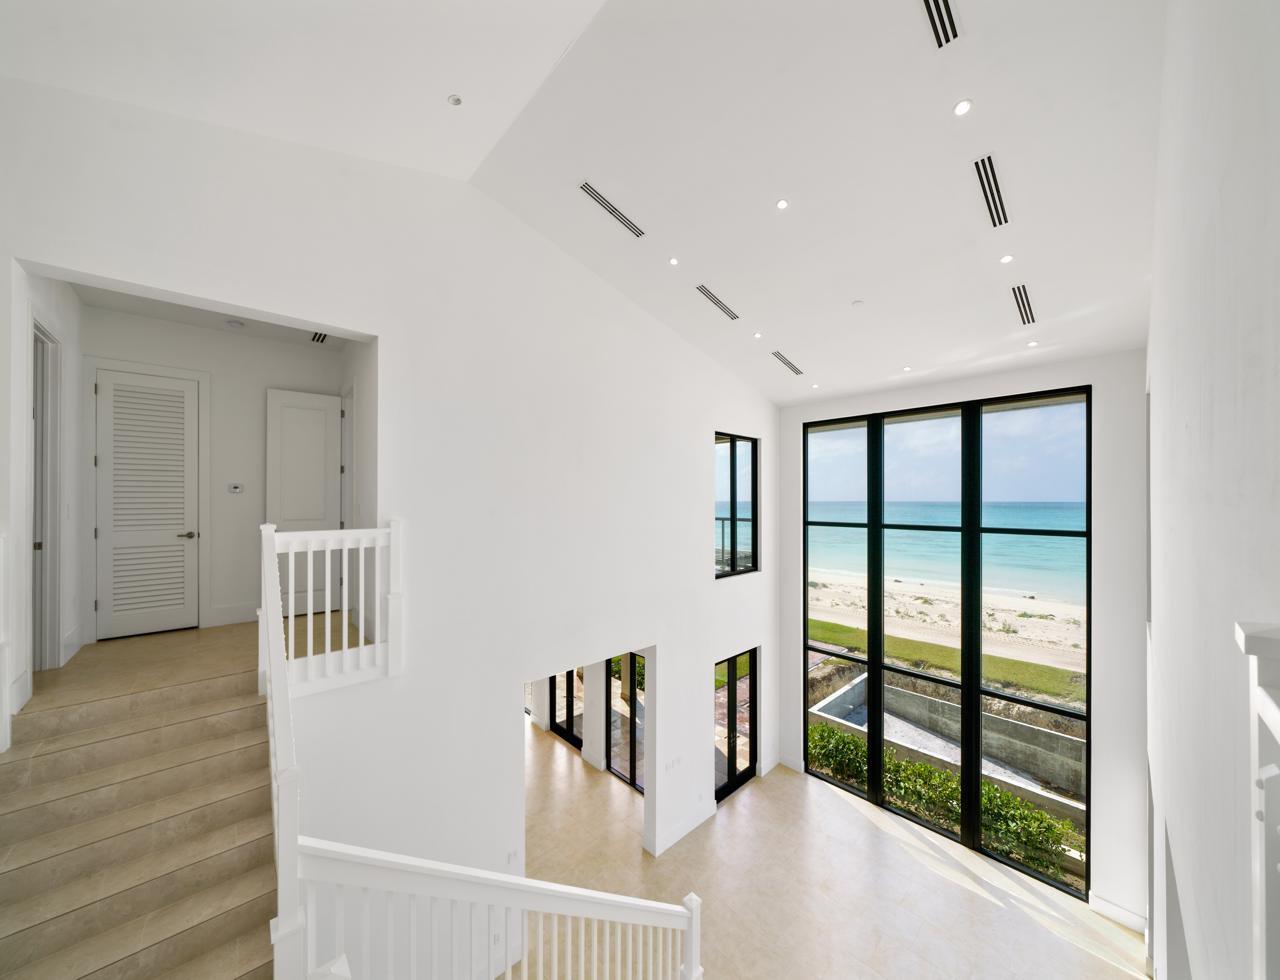 bimini.beachfront.home.for.sale.bahamas